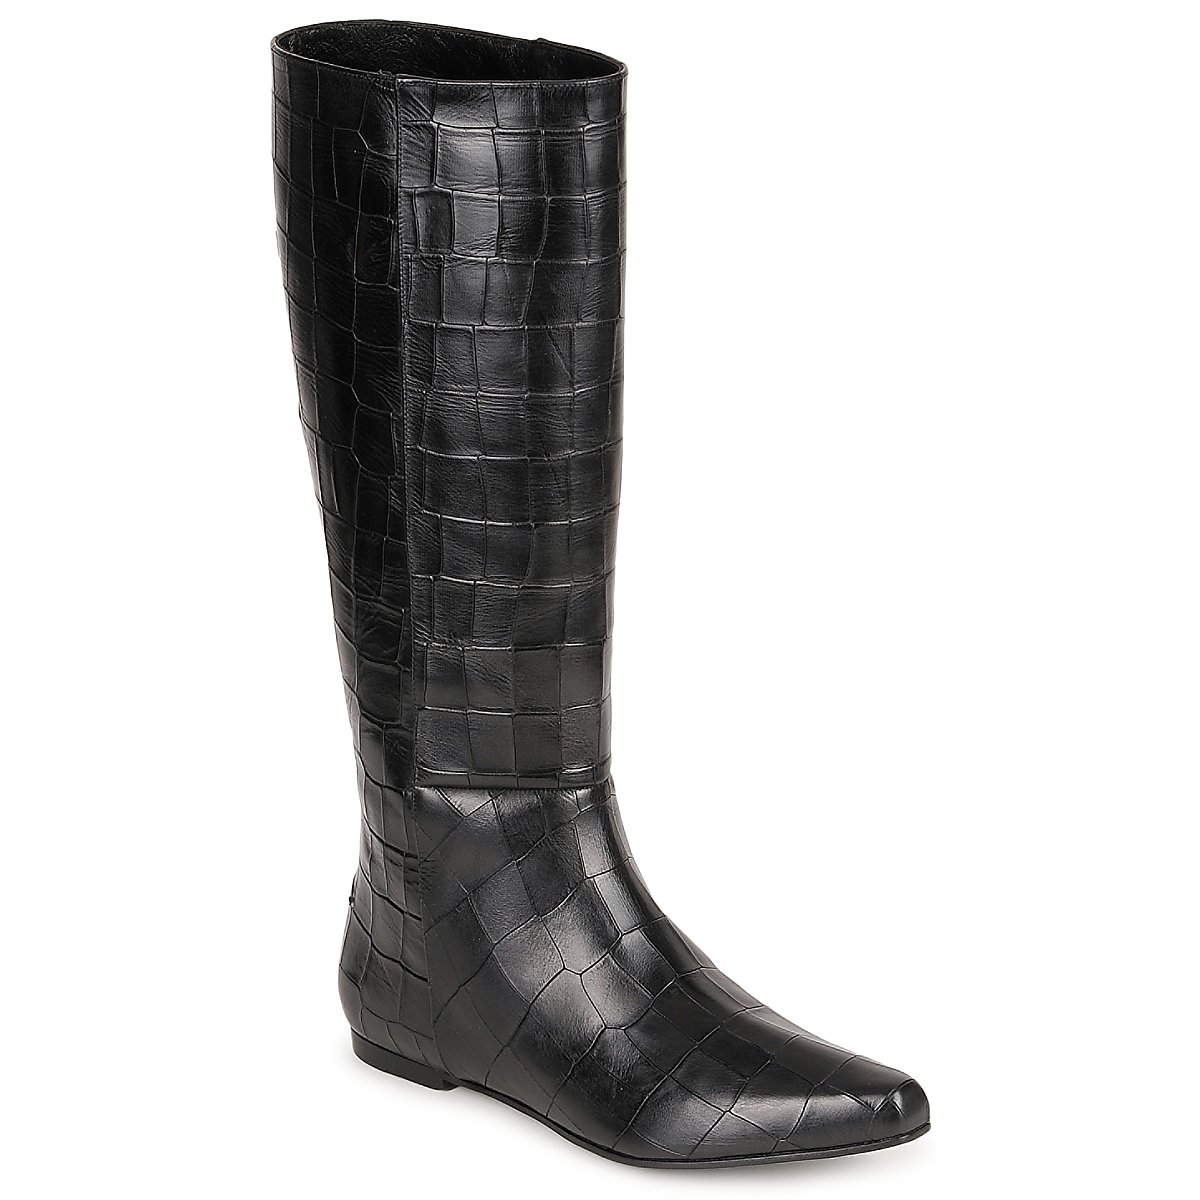 Støvler Roberto Cavalli  SPS749